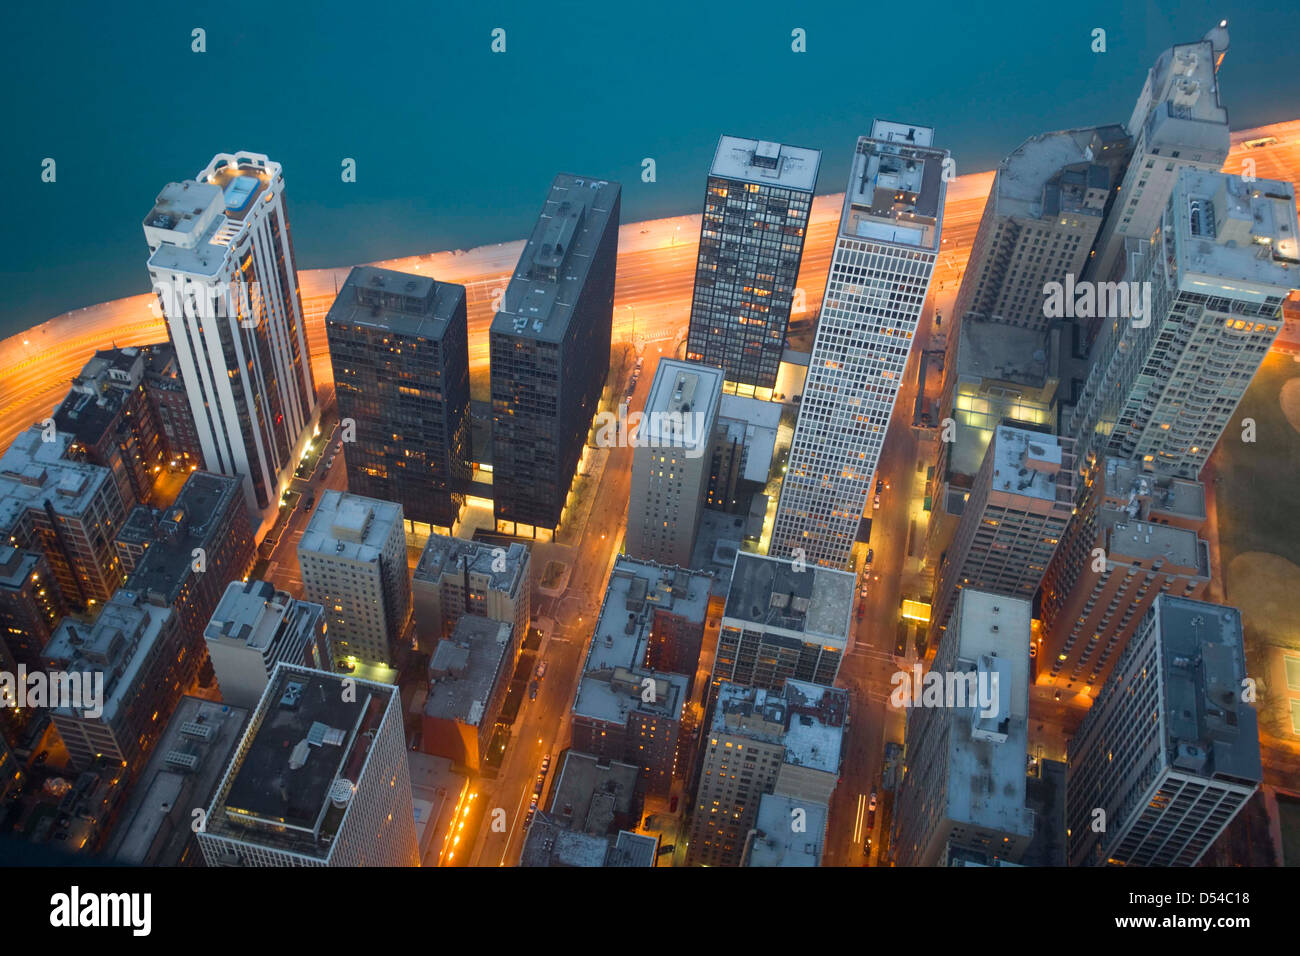 Chicago und Lake Michigan aus dem 94. Stockwerk des John Hancock Building, Chicago, Illinois Stockbild